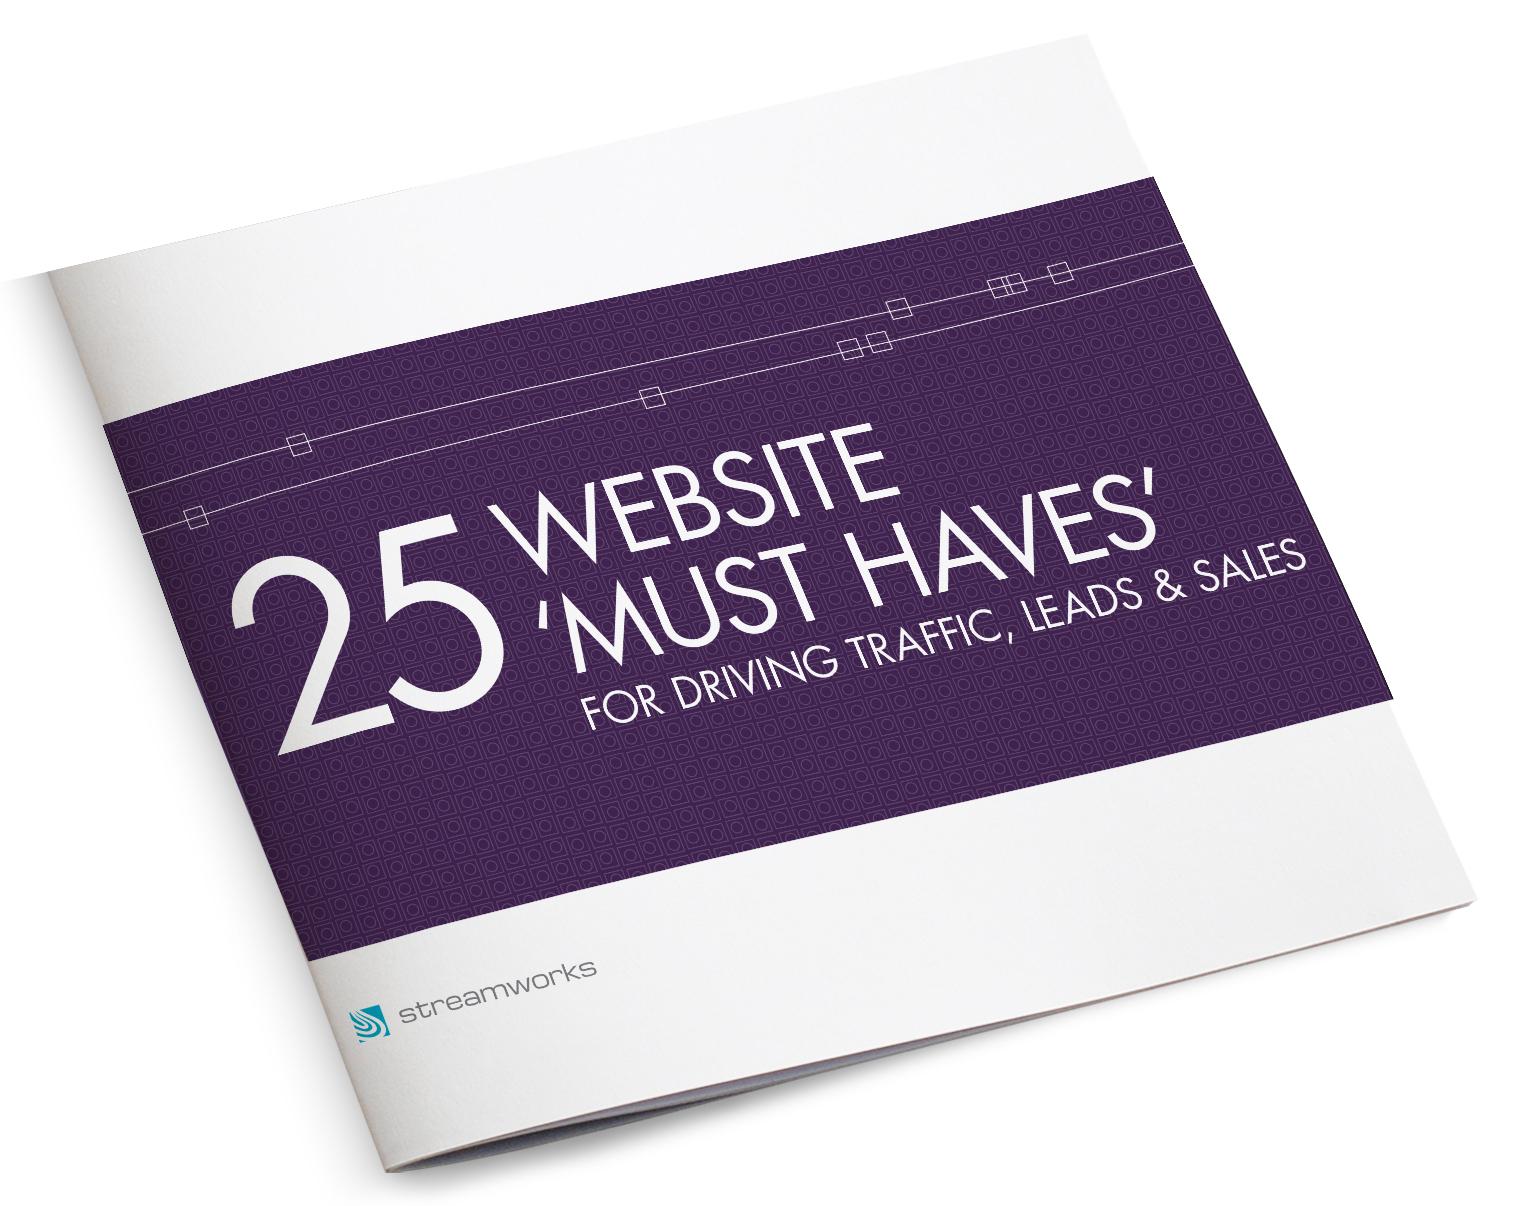 25_Website_Must_Haves